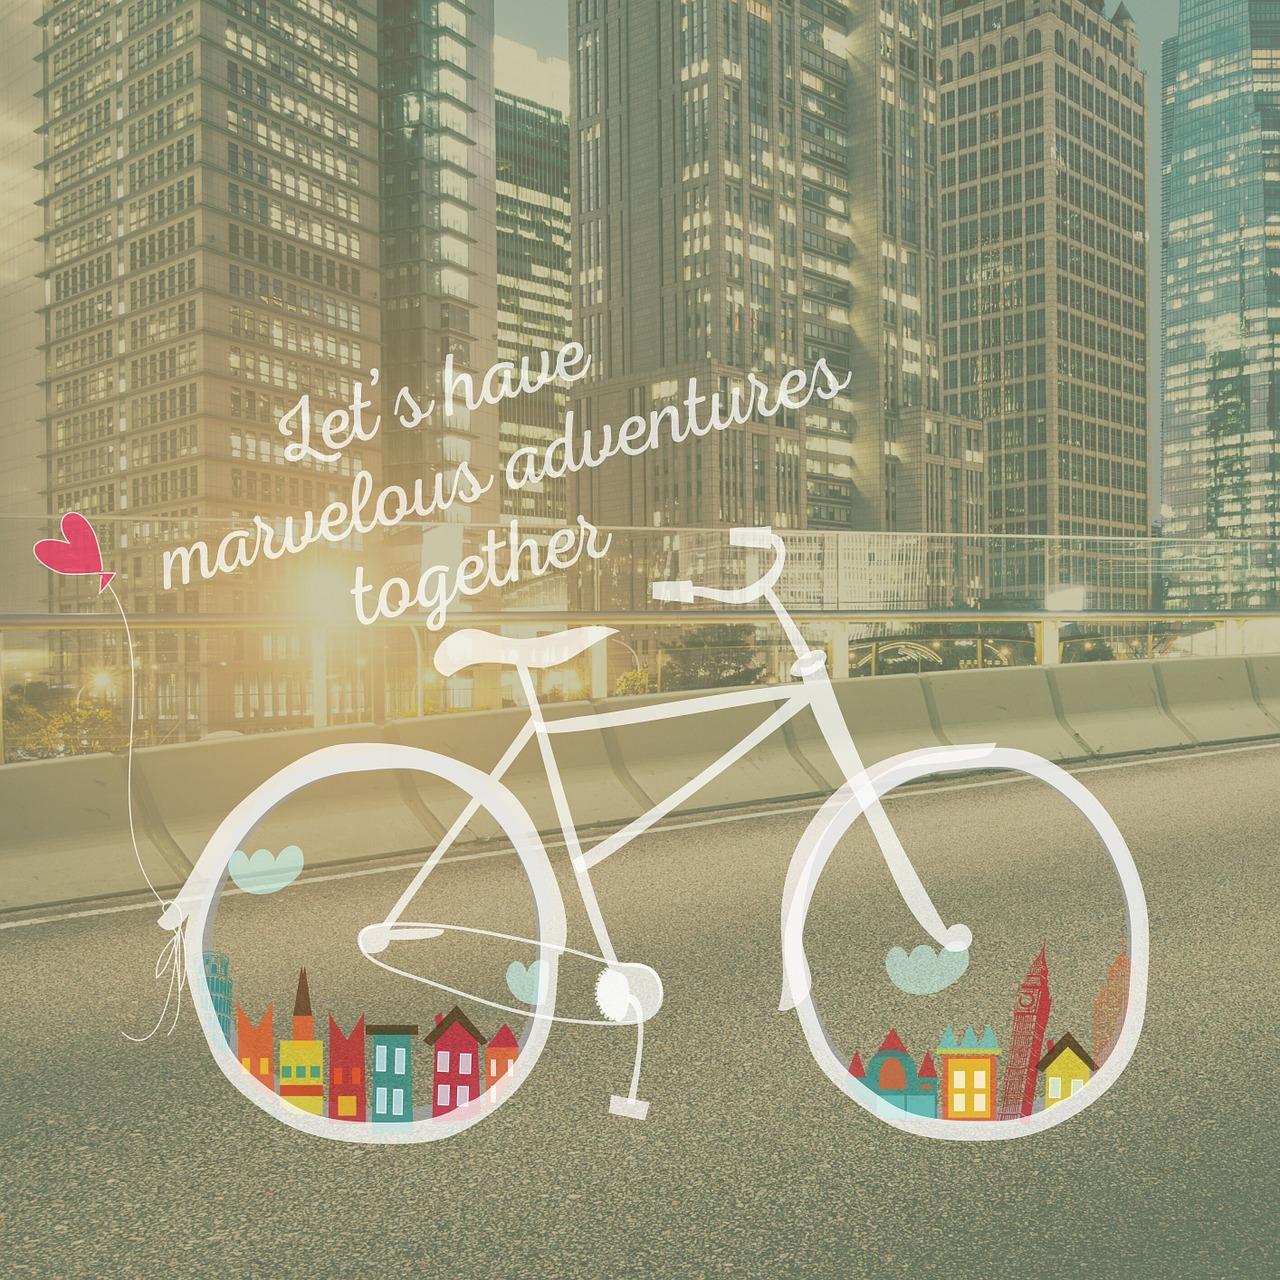 cycling-905967_1280